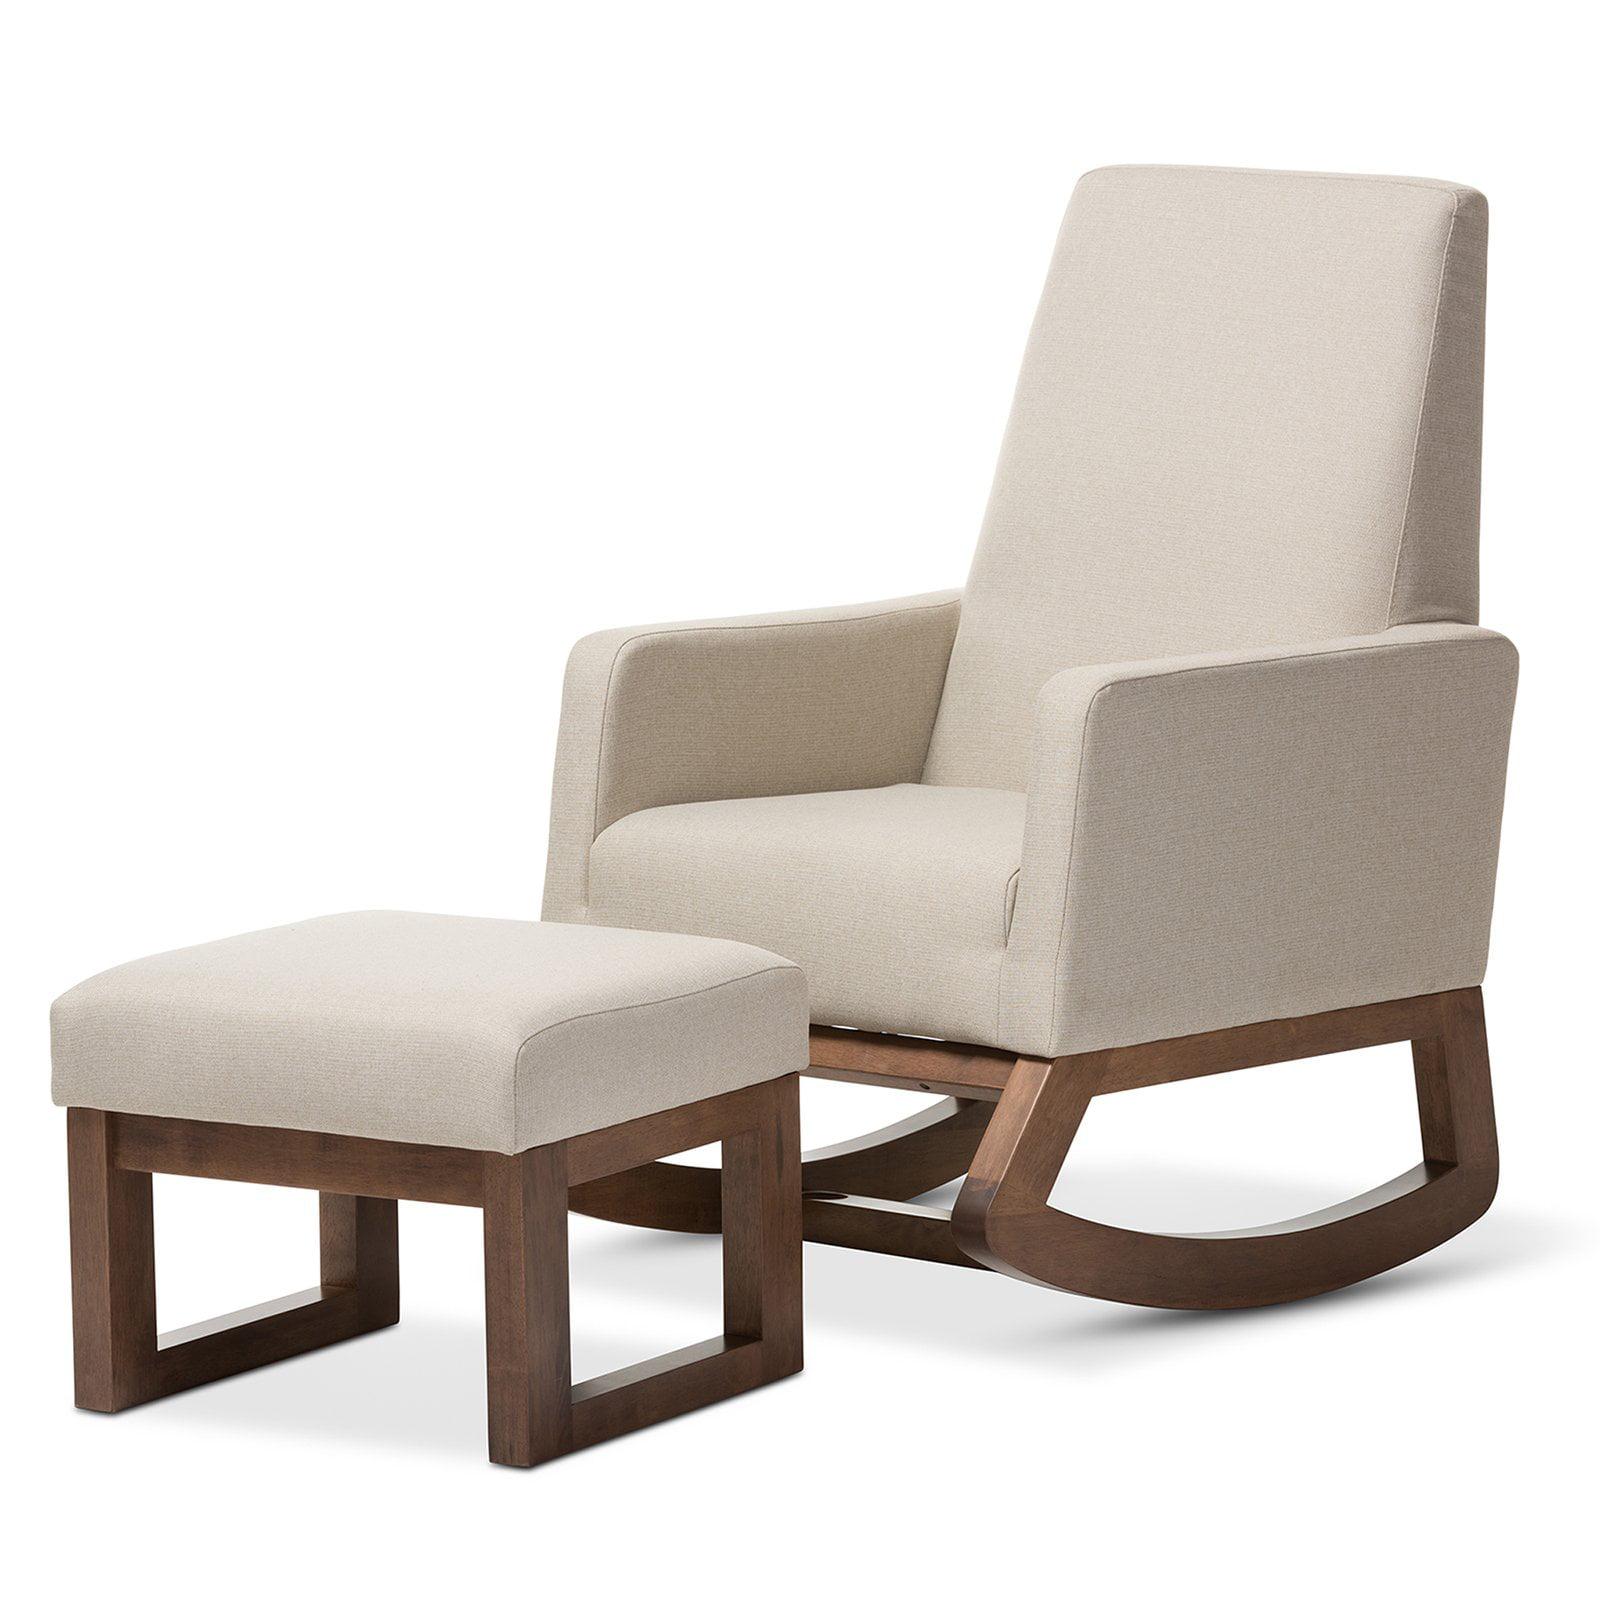 Baxton Studio Yashiya Mid Century Retro Modern Rocking Chair And Ottoman  Set   Walmart.com